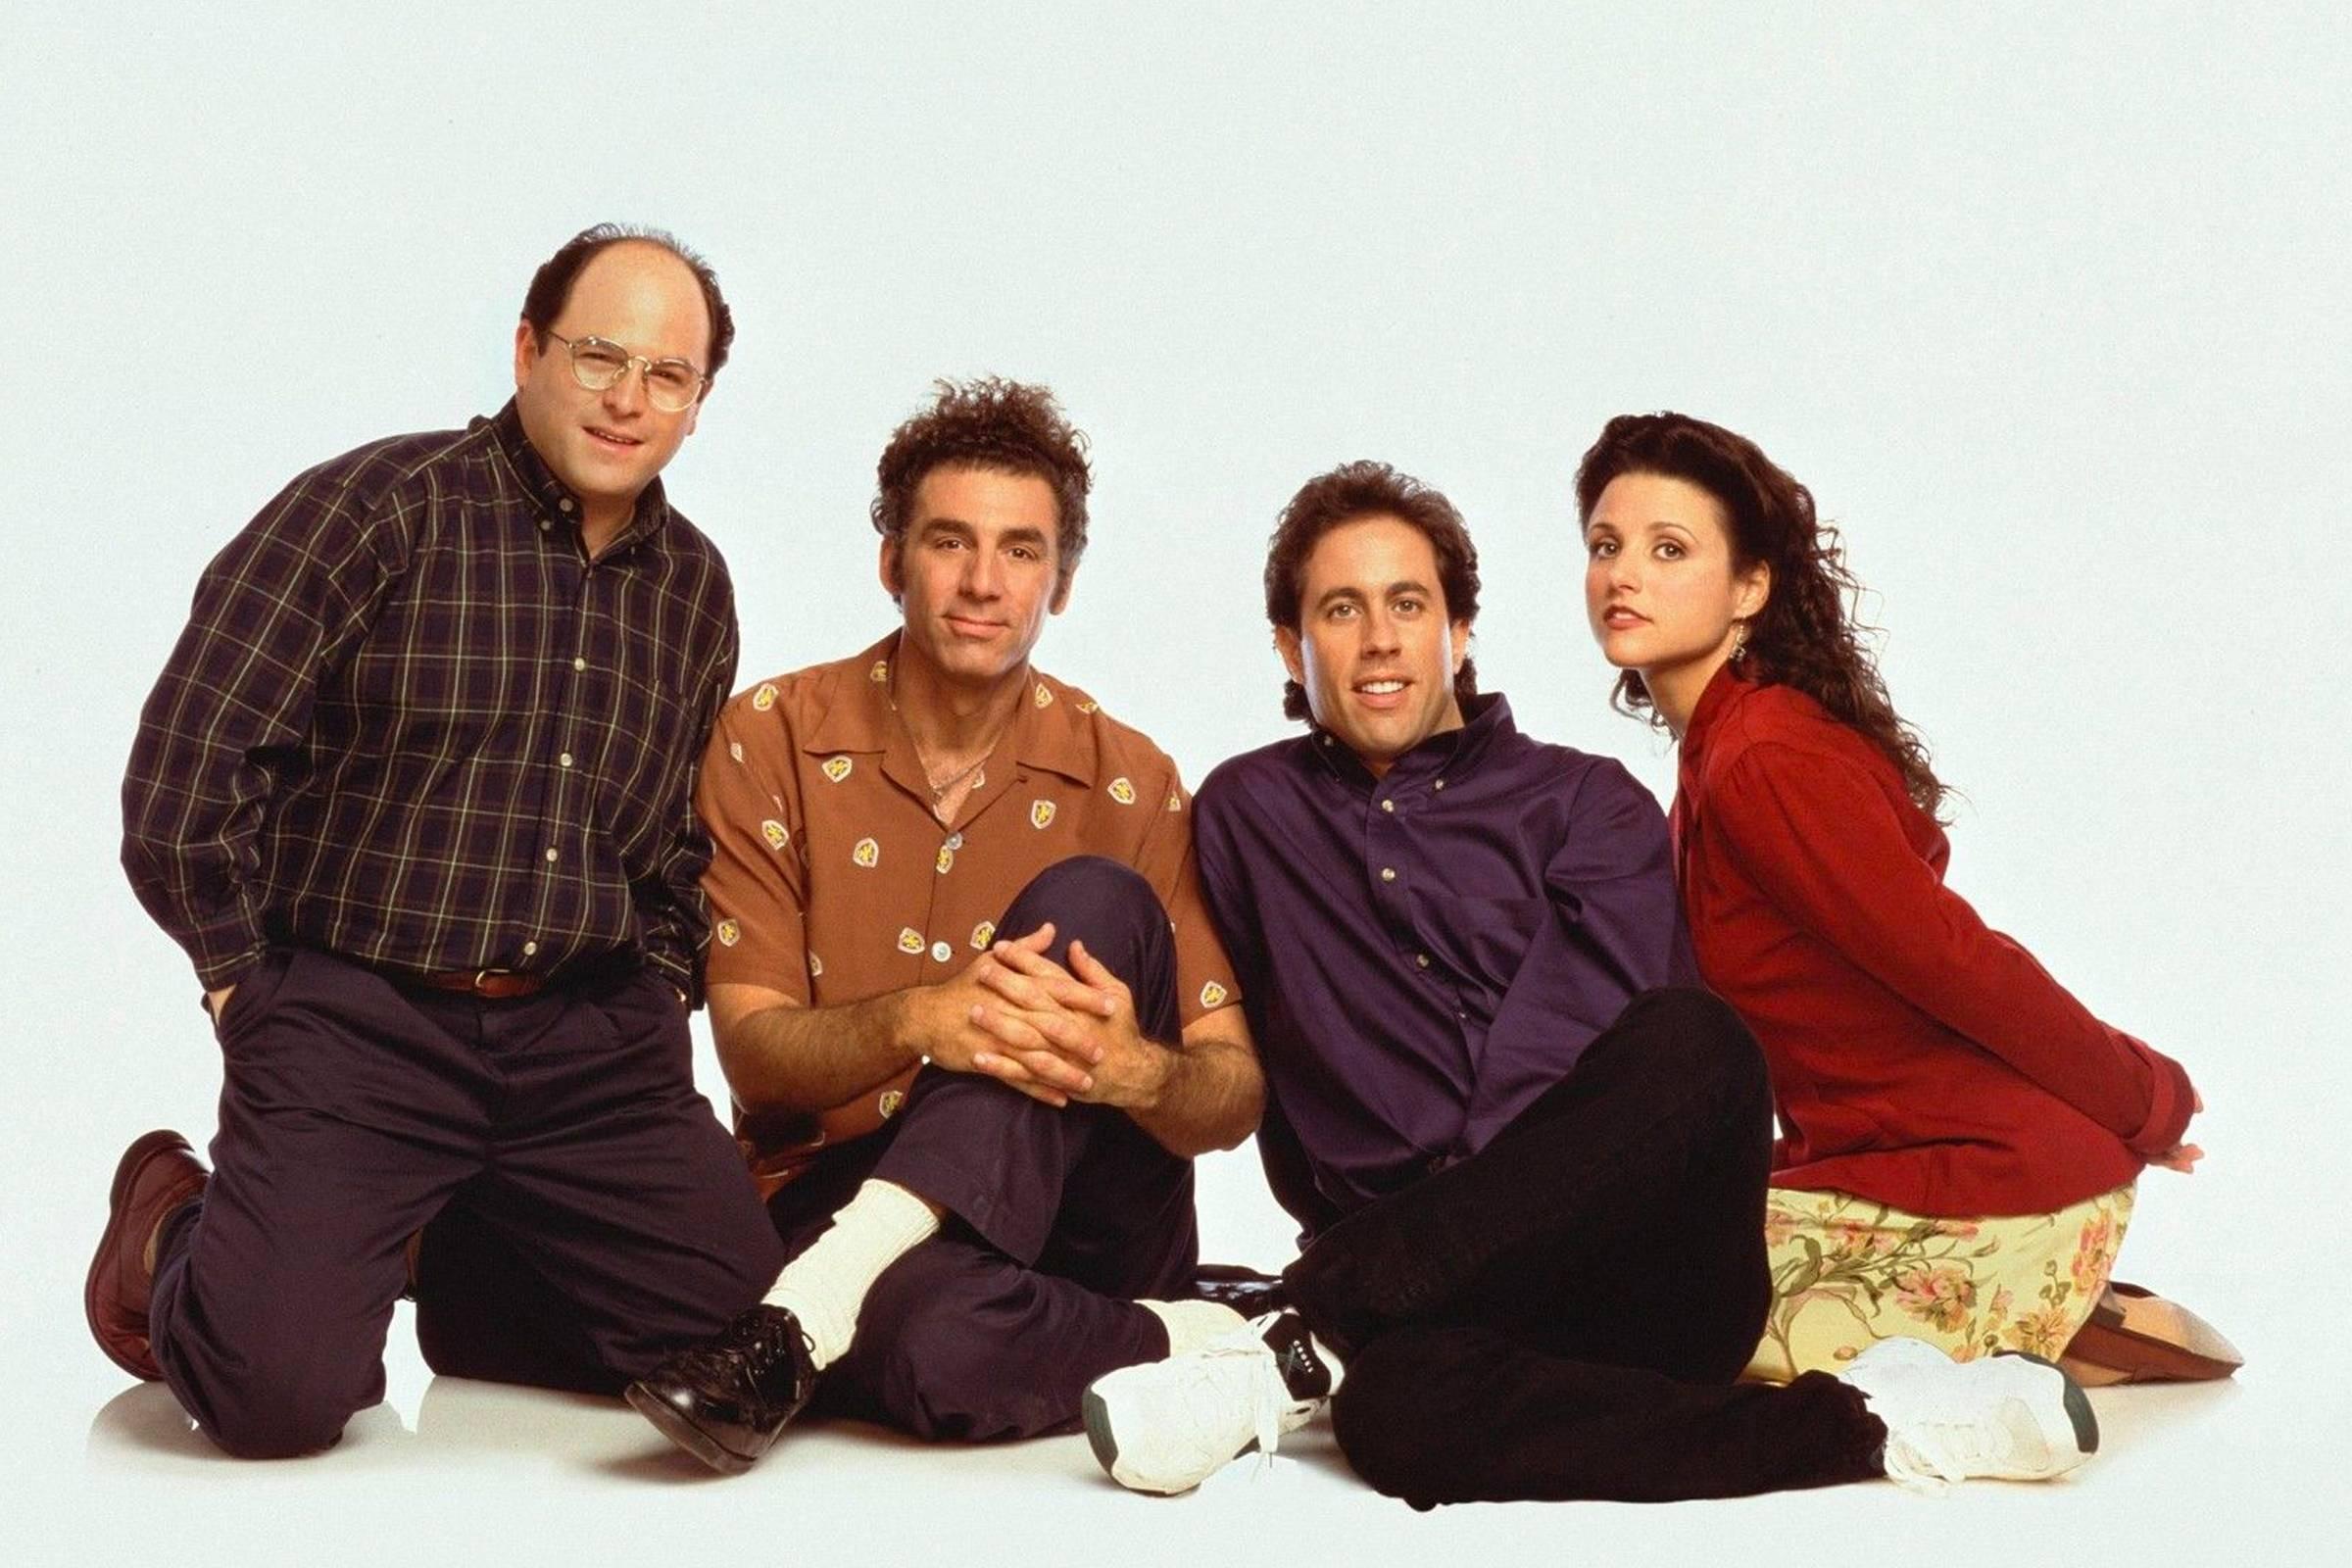 """Seinfeld"" (1989-1998)"